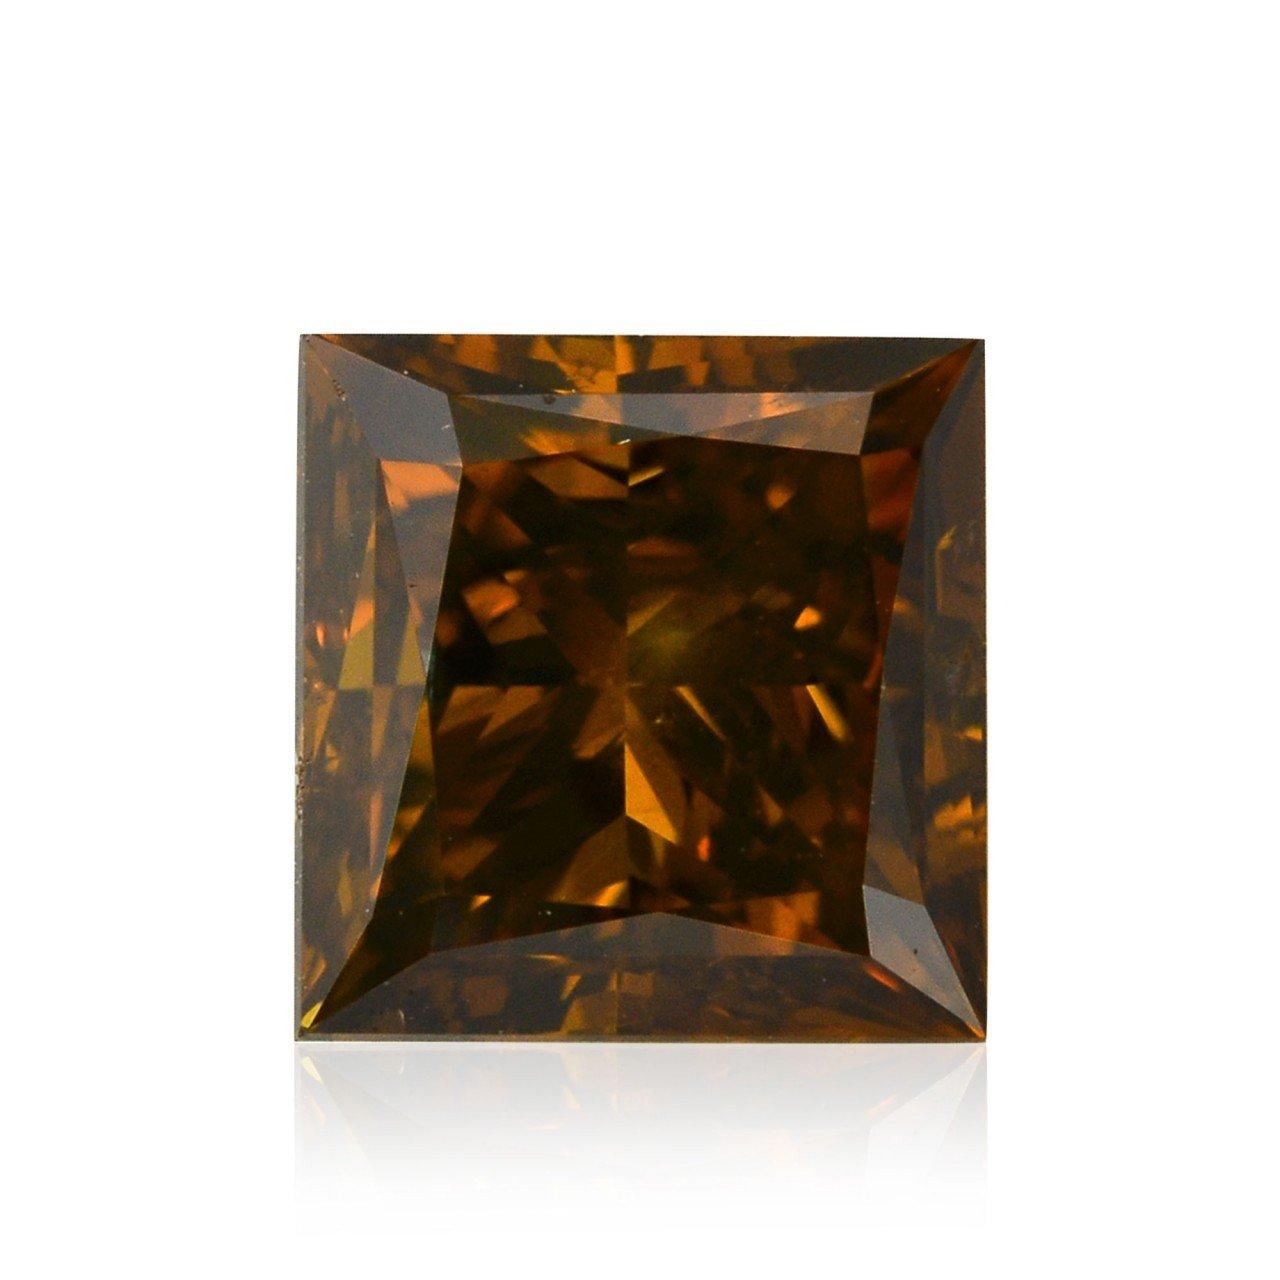 1.01Cts Fancy Deep Orange Brown Loose Diamond Natural Color Princess Shape GIA